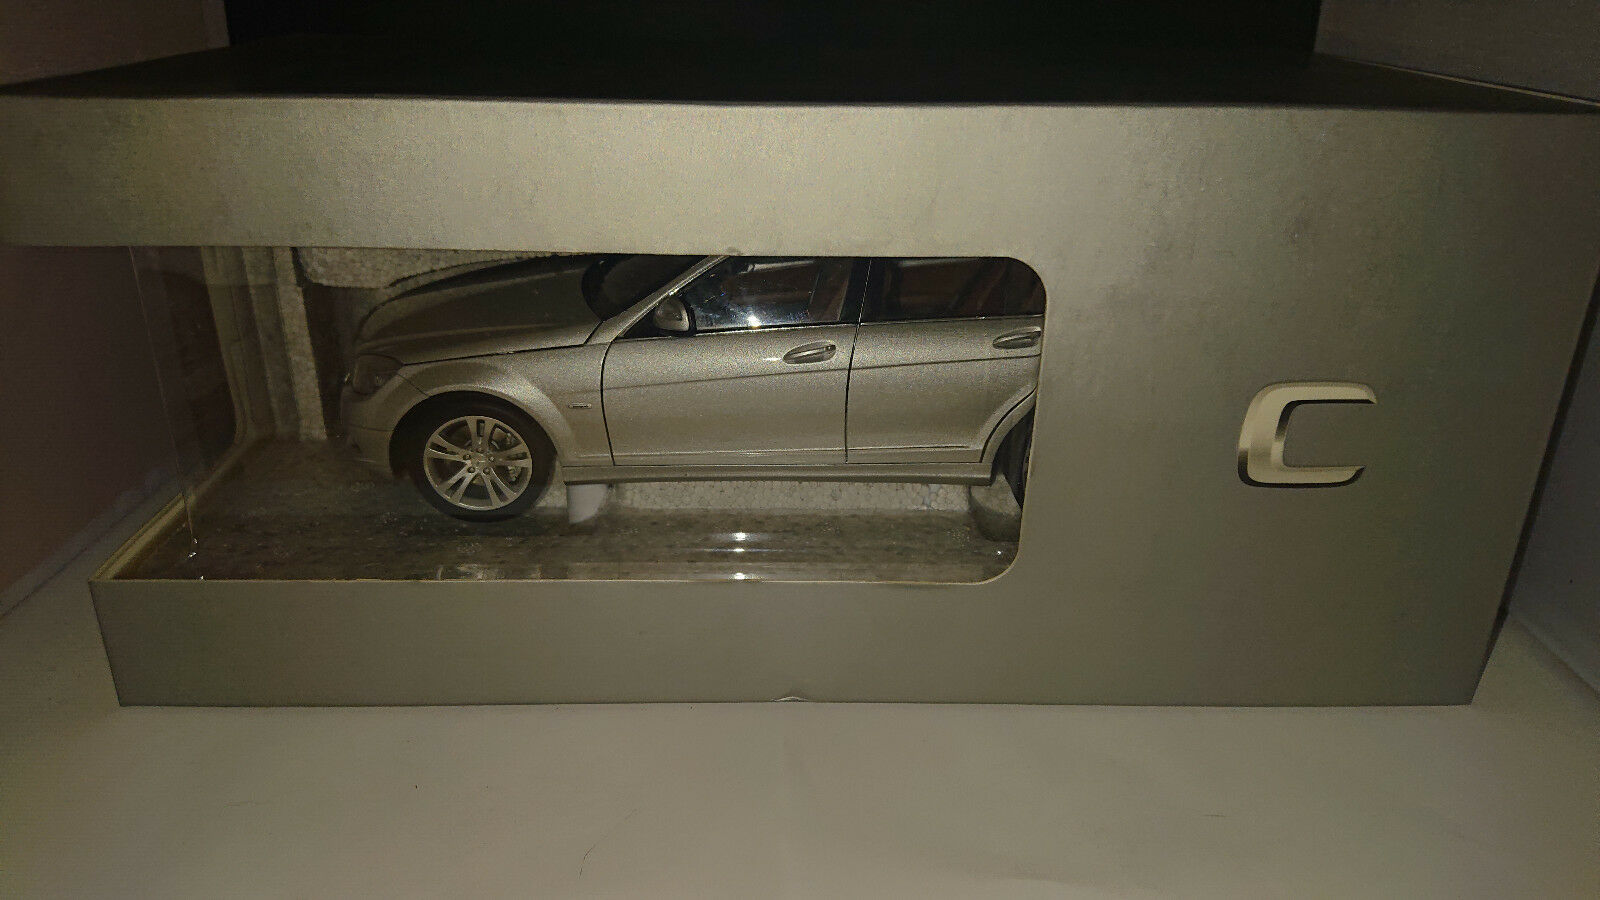 1 18 Autoart Mercedes Classe C c350 AVANTGARDE argentmet. w204 NEUF neuf dans sa boîte